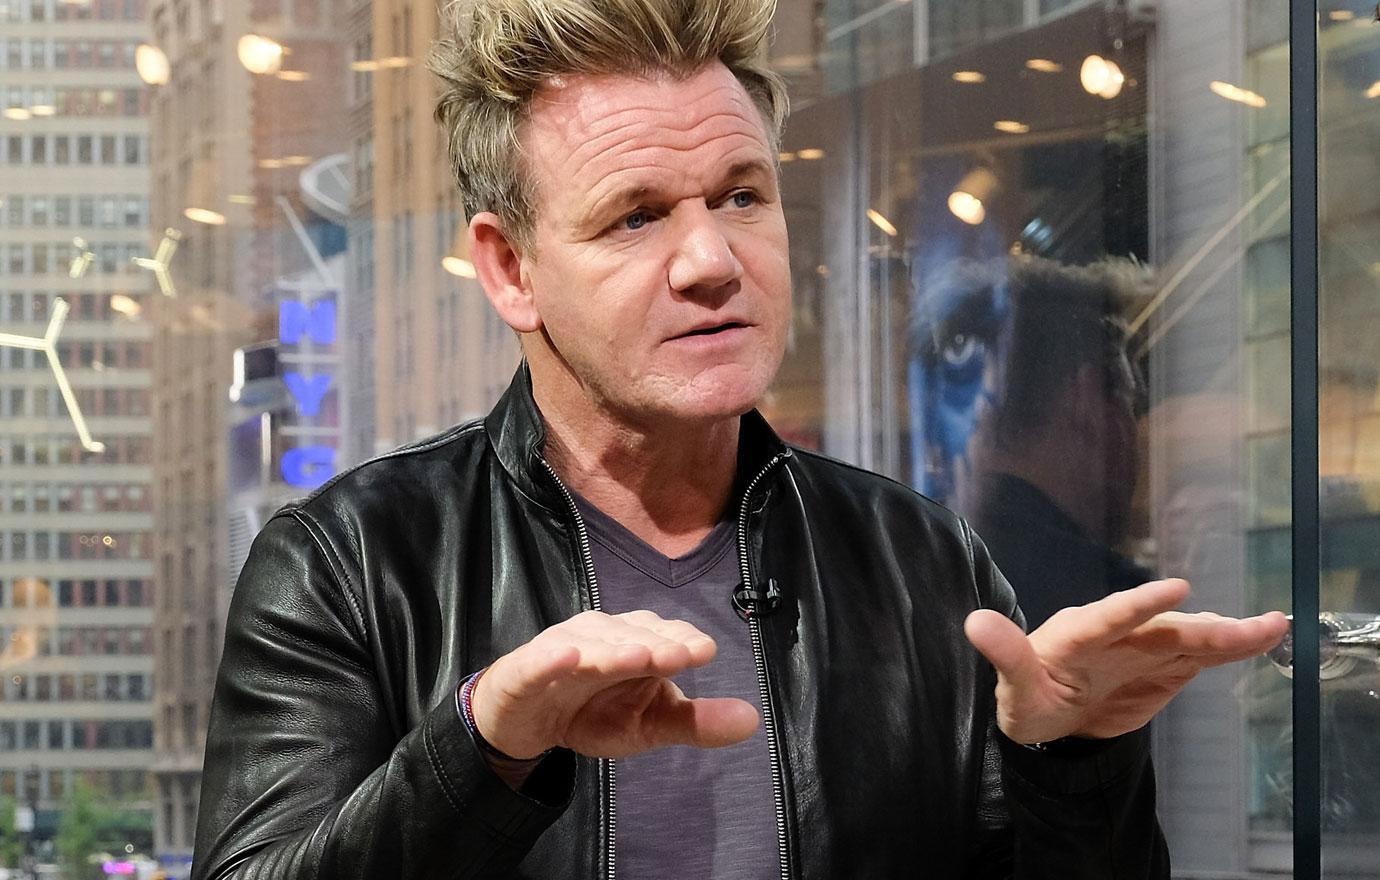 Gordon Ramsay Colombia Death Fears